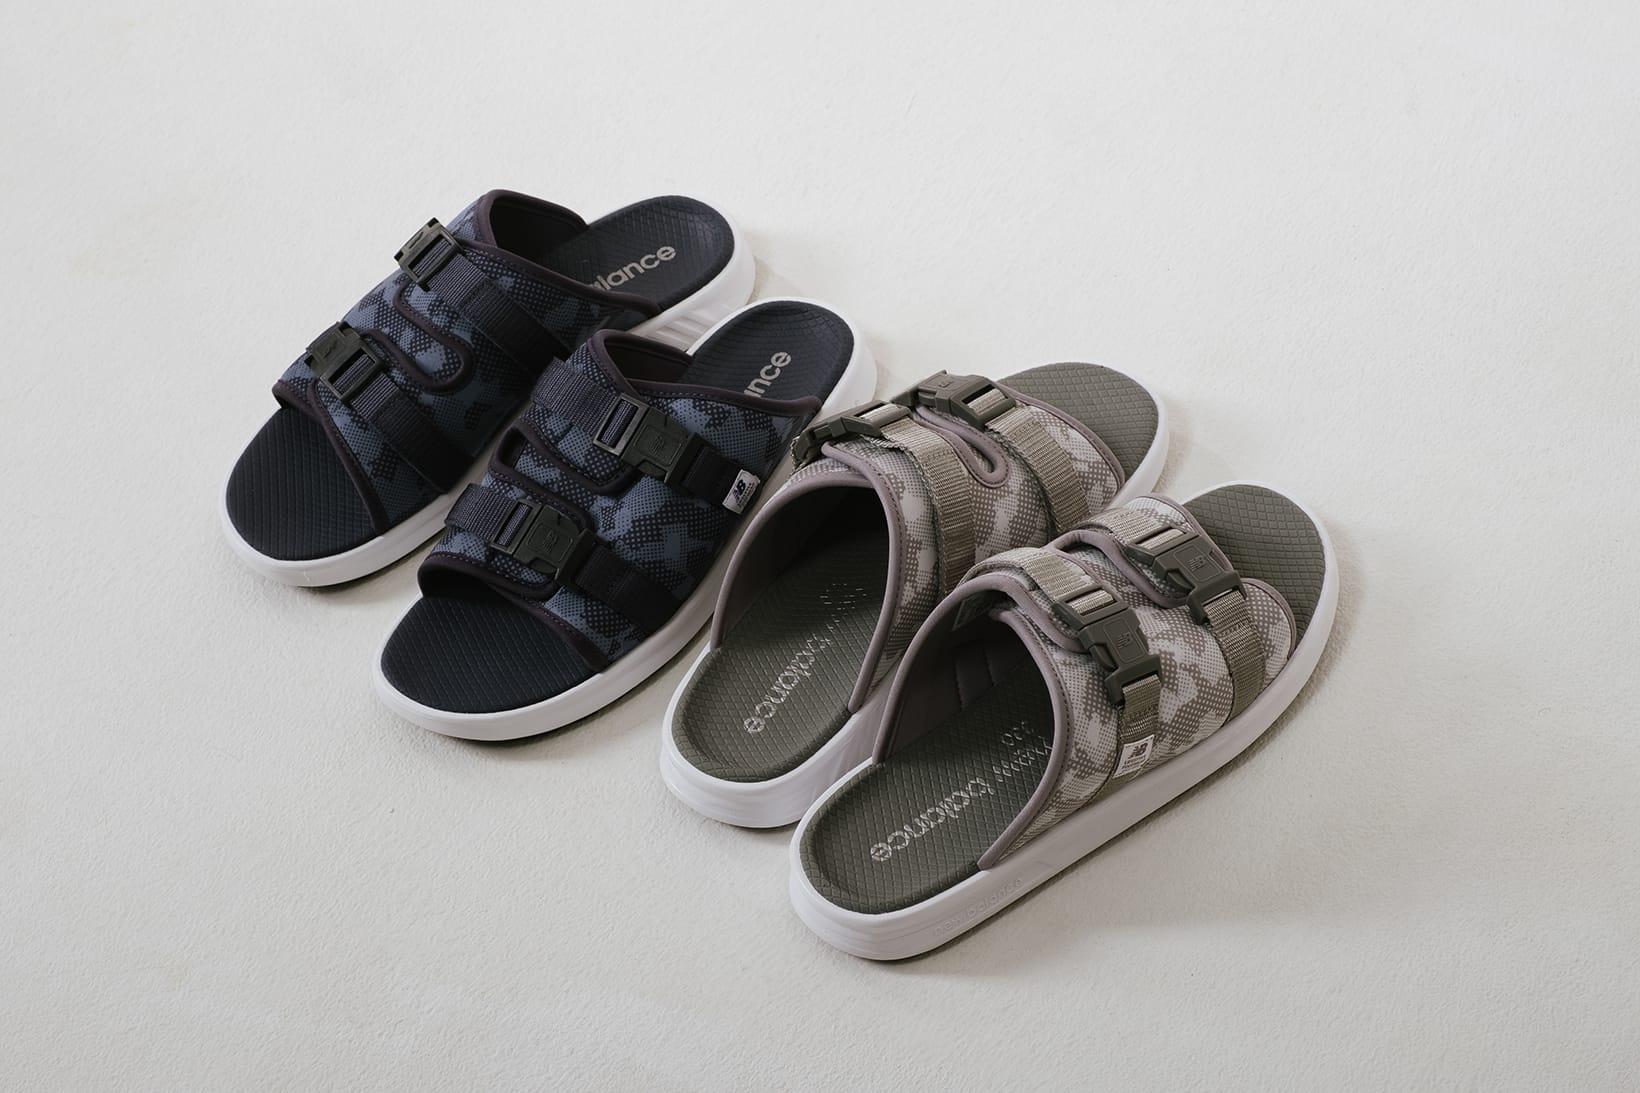 New Balance Summer-Ready Sandal